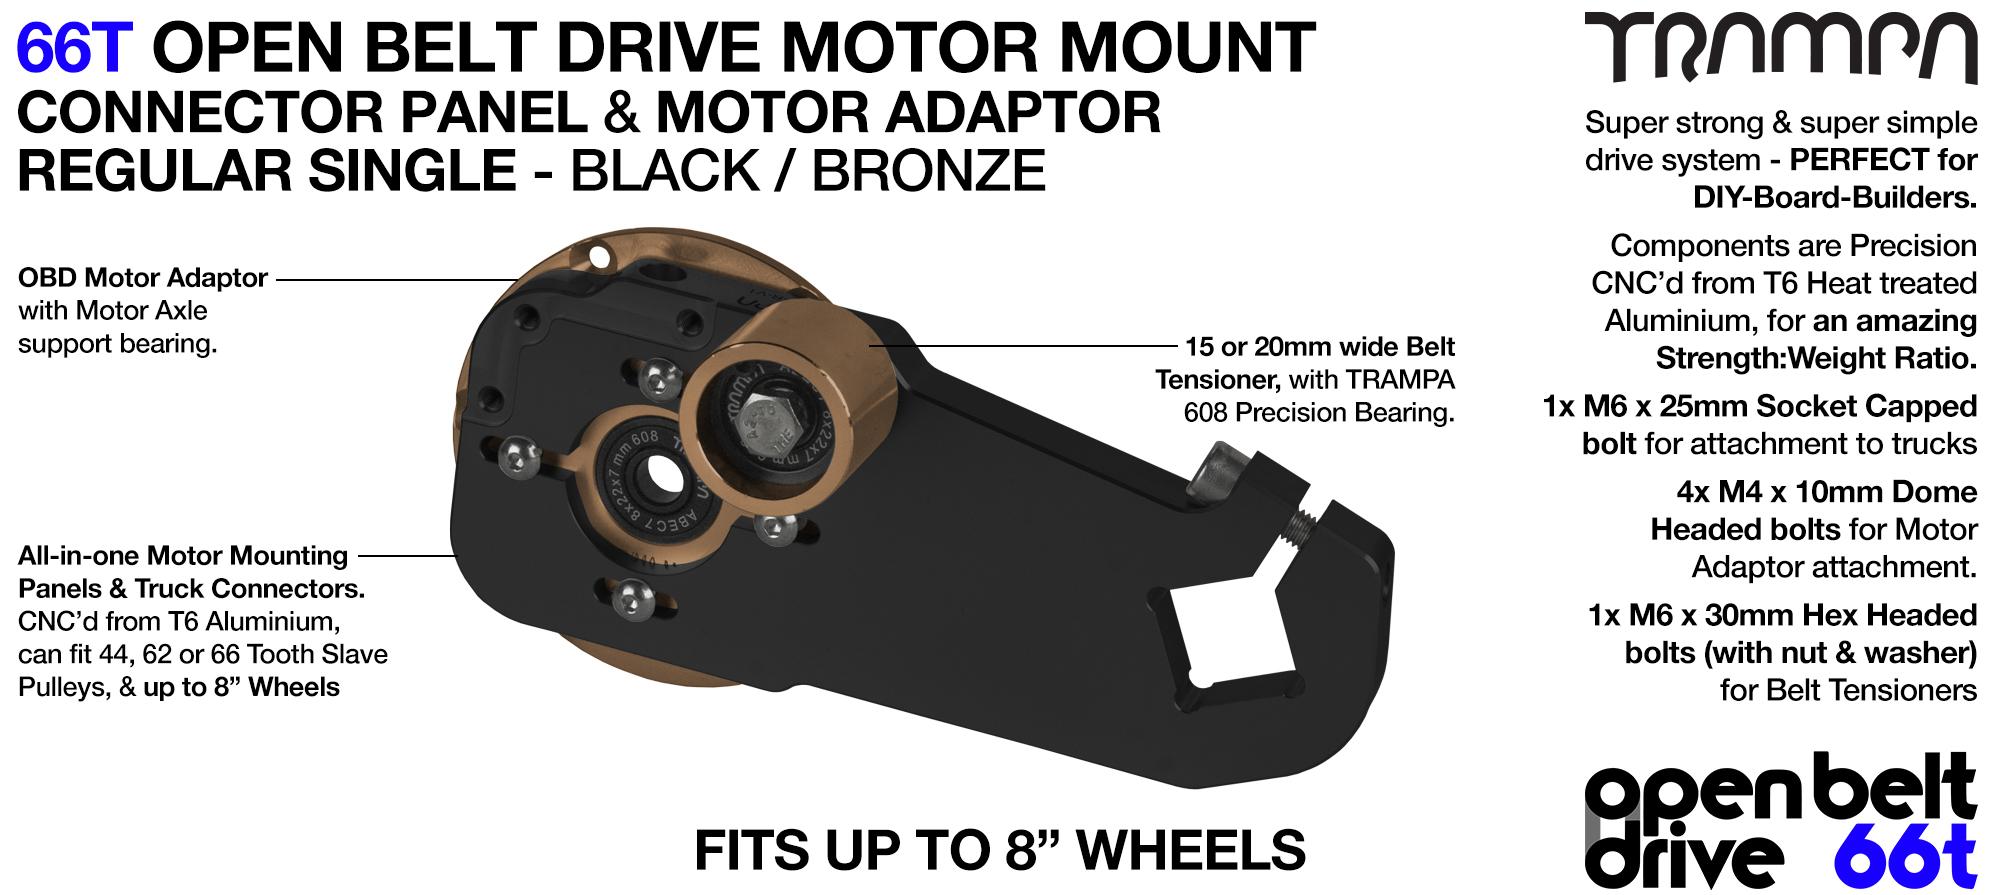 66T OPEN BELT DRIVE Motor Mount & Motor Adaptor - SINGLE BRONZE